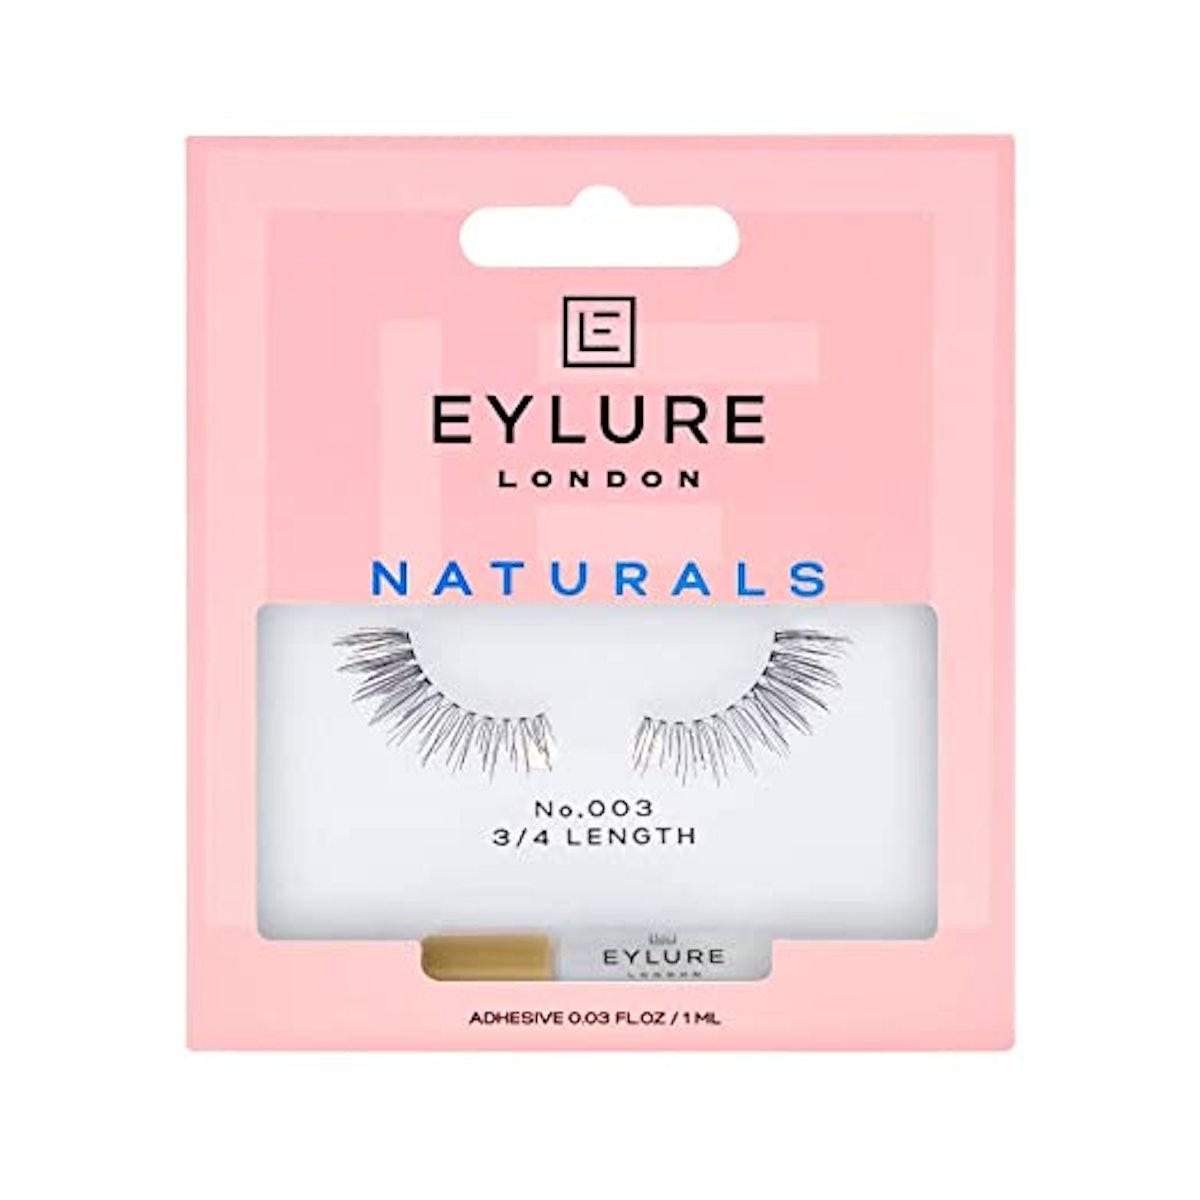 Eylure Naturals False Lashes